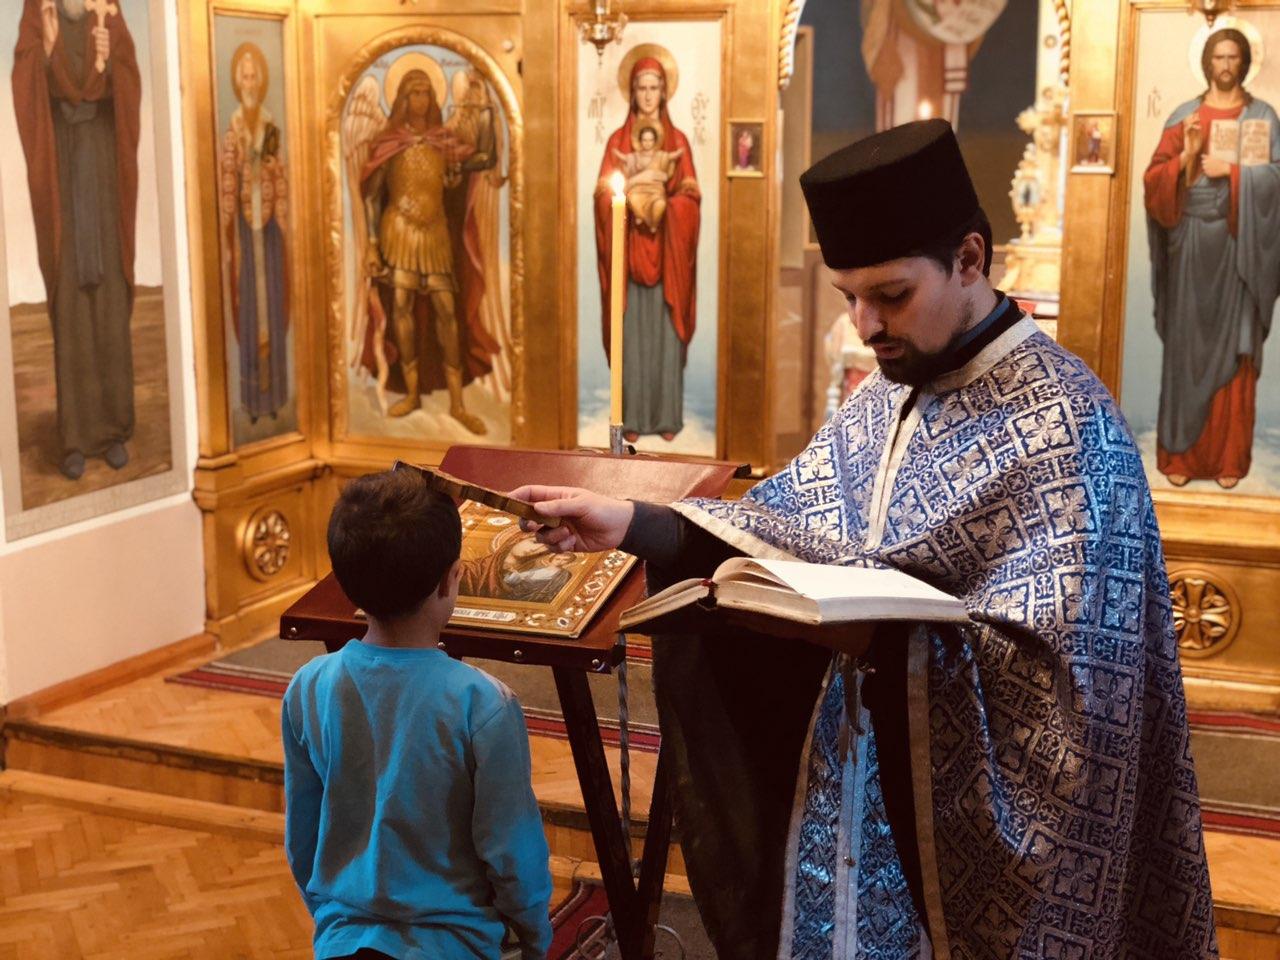 CRKVA SVRLJIG: Veliki broj vernika na služenju akatista Presvetoj Bogorodici